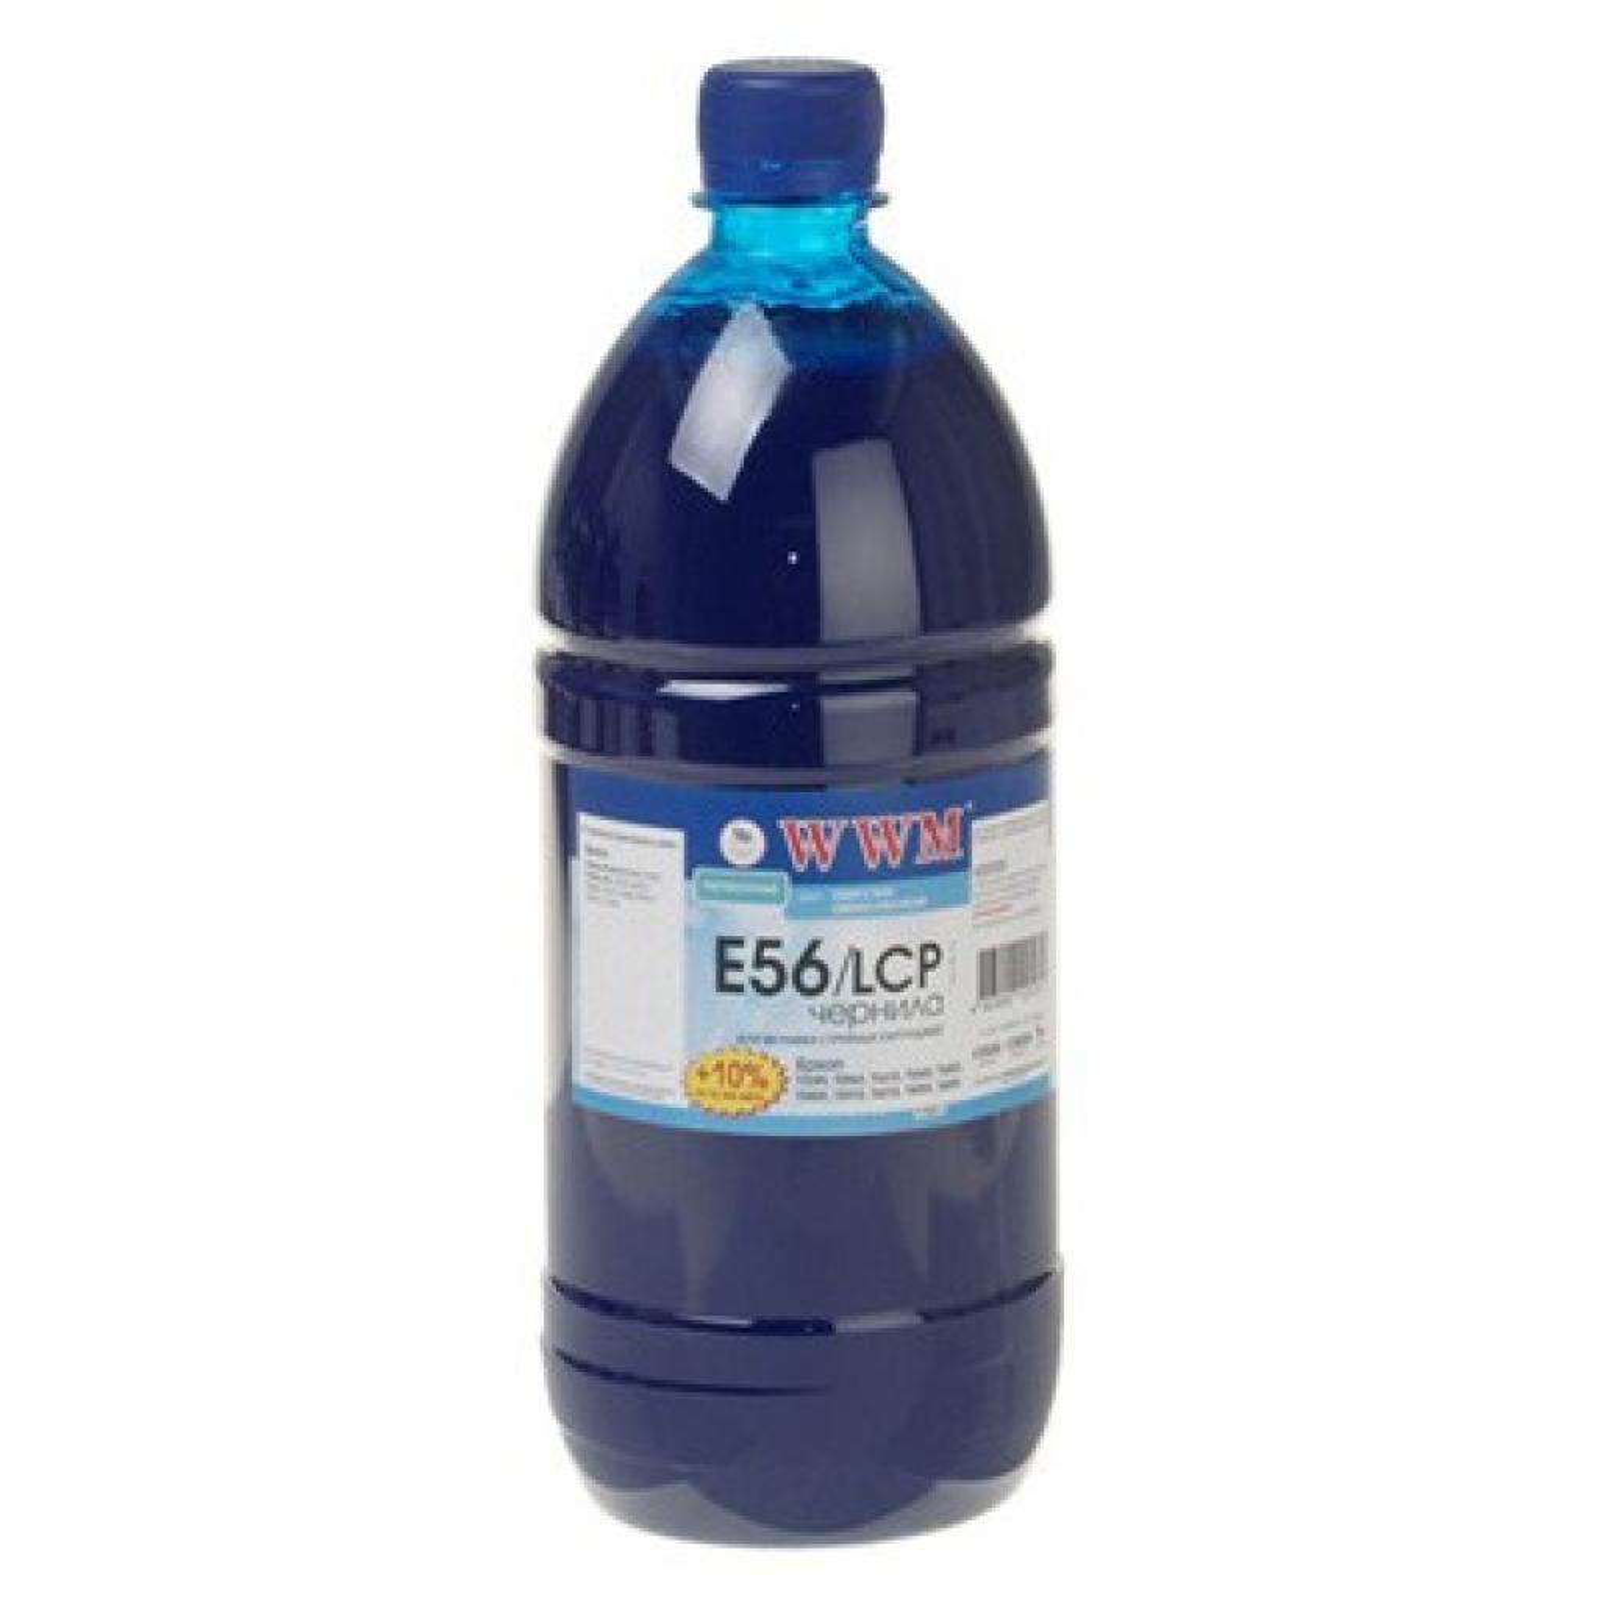 Чернила WWM EPSON R2400/Pro7800 Light Cyan Pigm (E56/LCP)